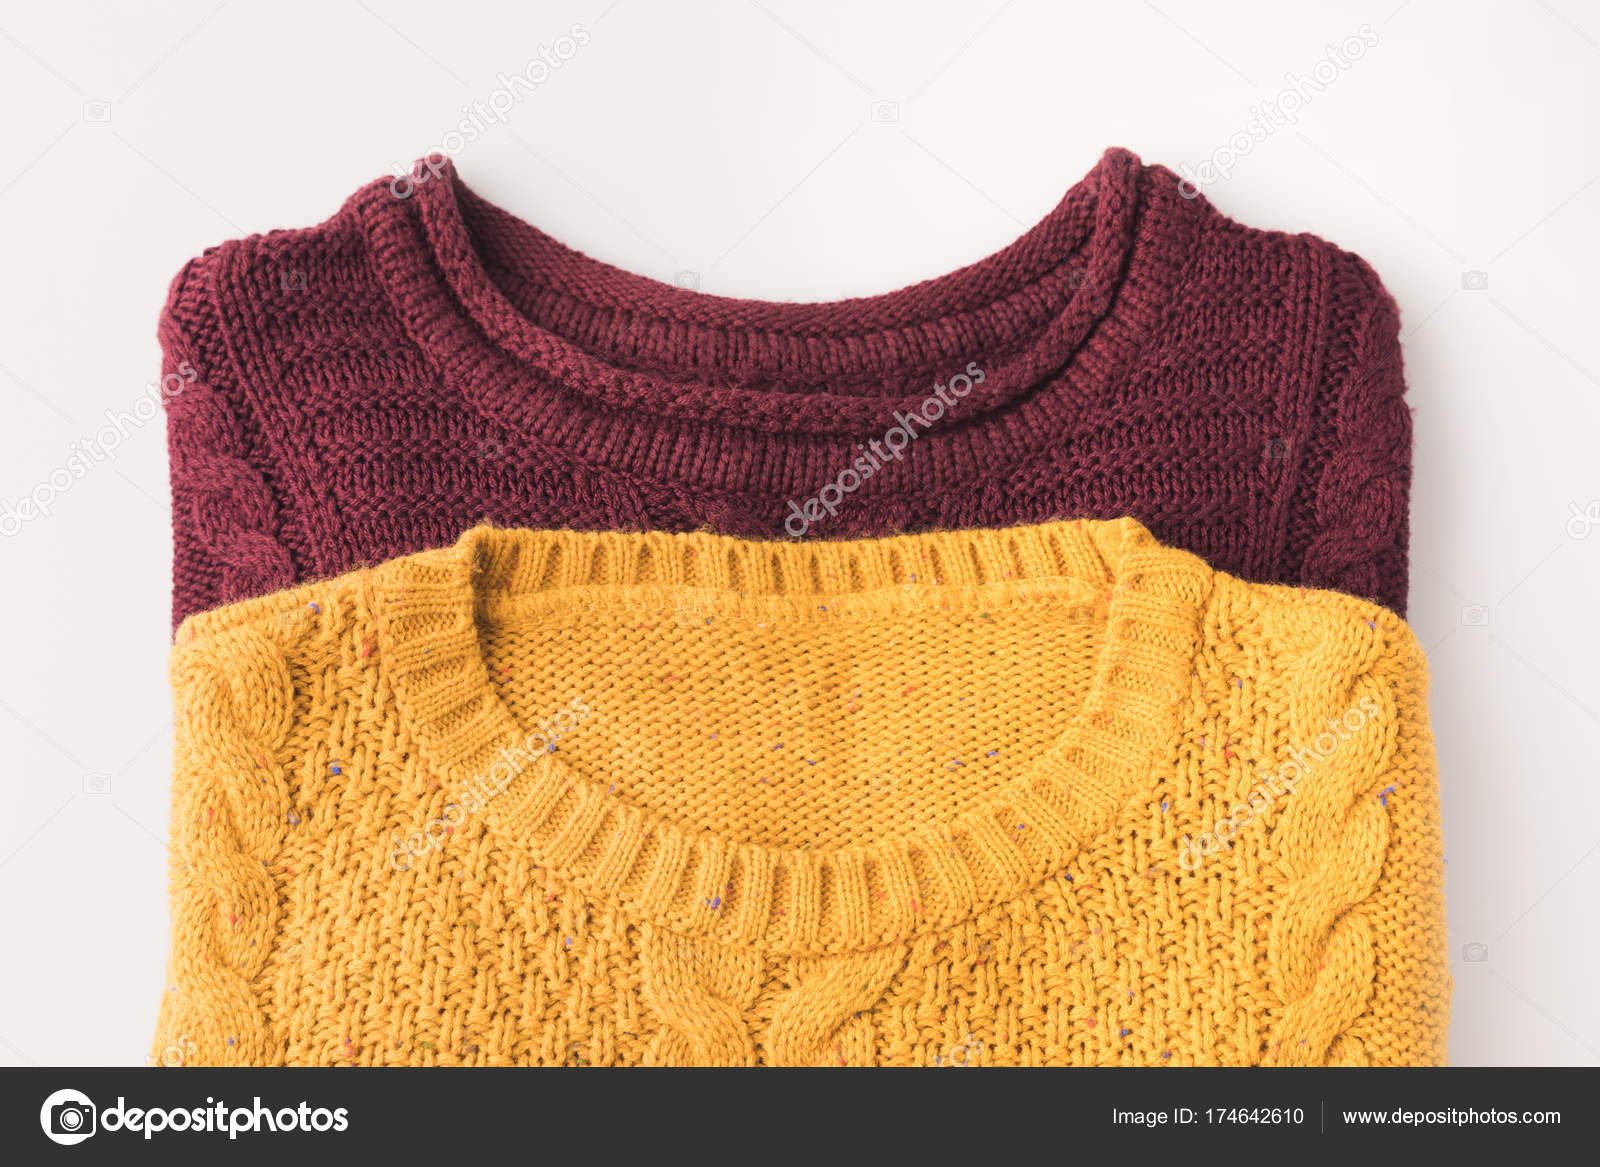 81bdcb70388b πλεκτό πουλόβερ Μπορντό και κίτρινο — Φωτογραφία Αρχείου ...